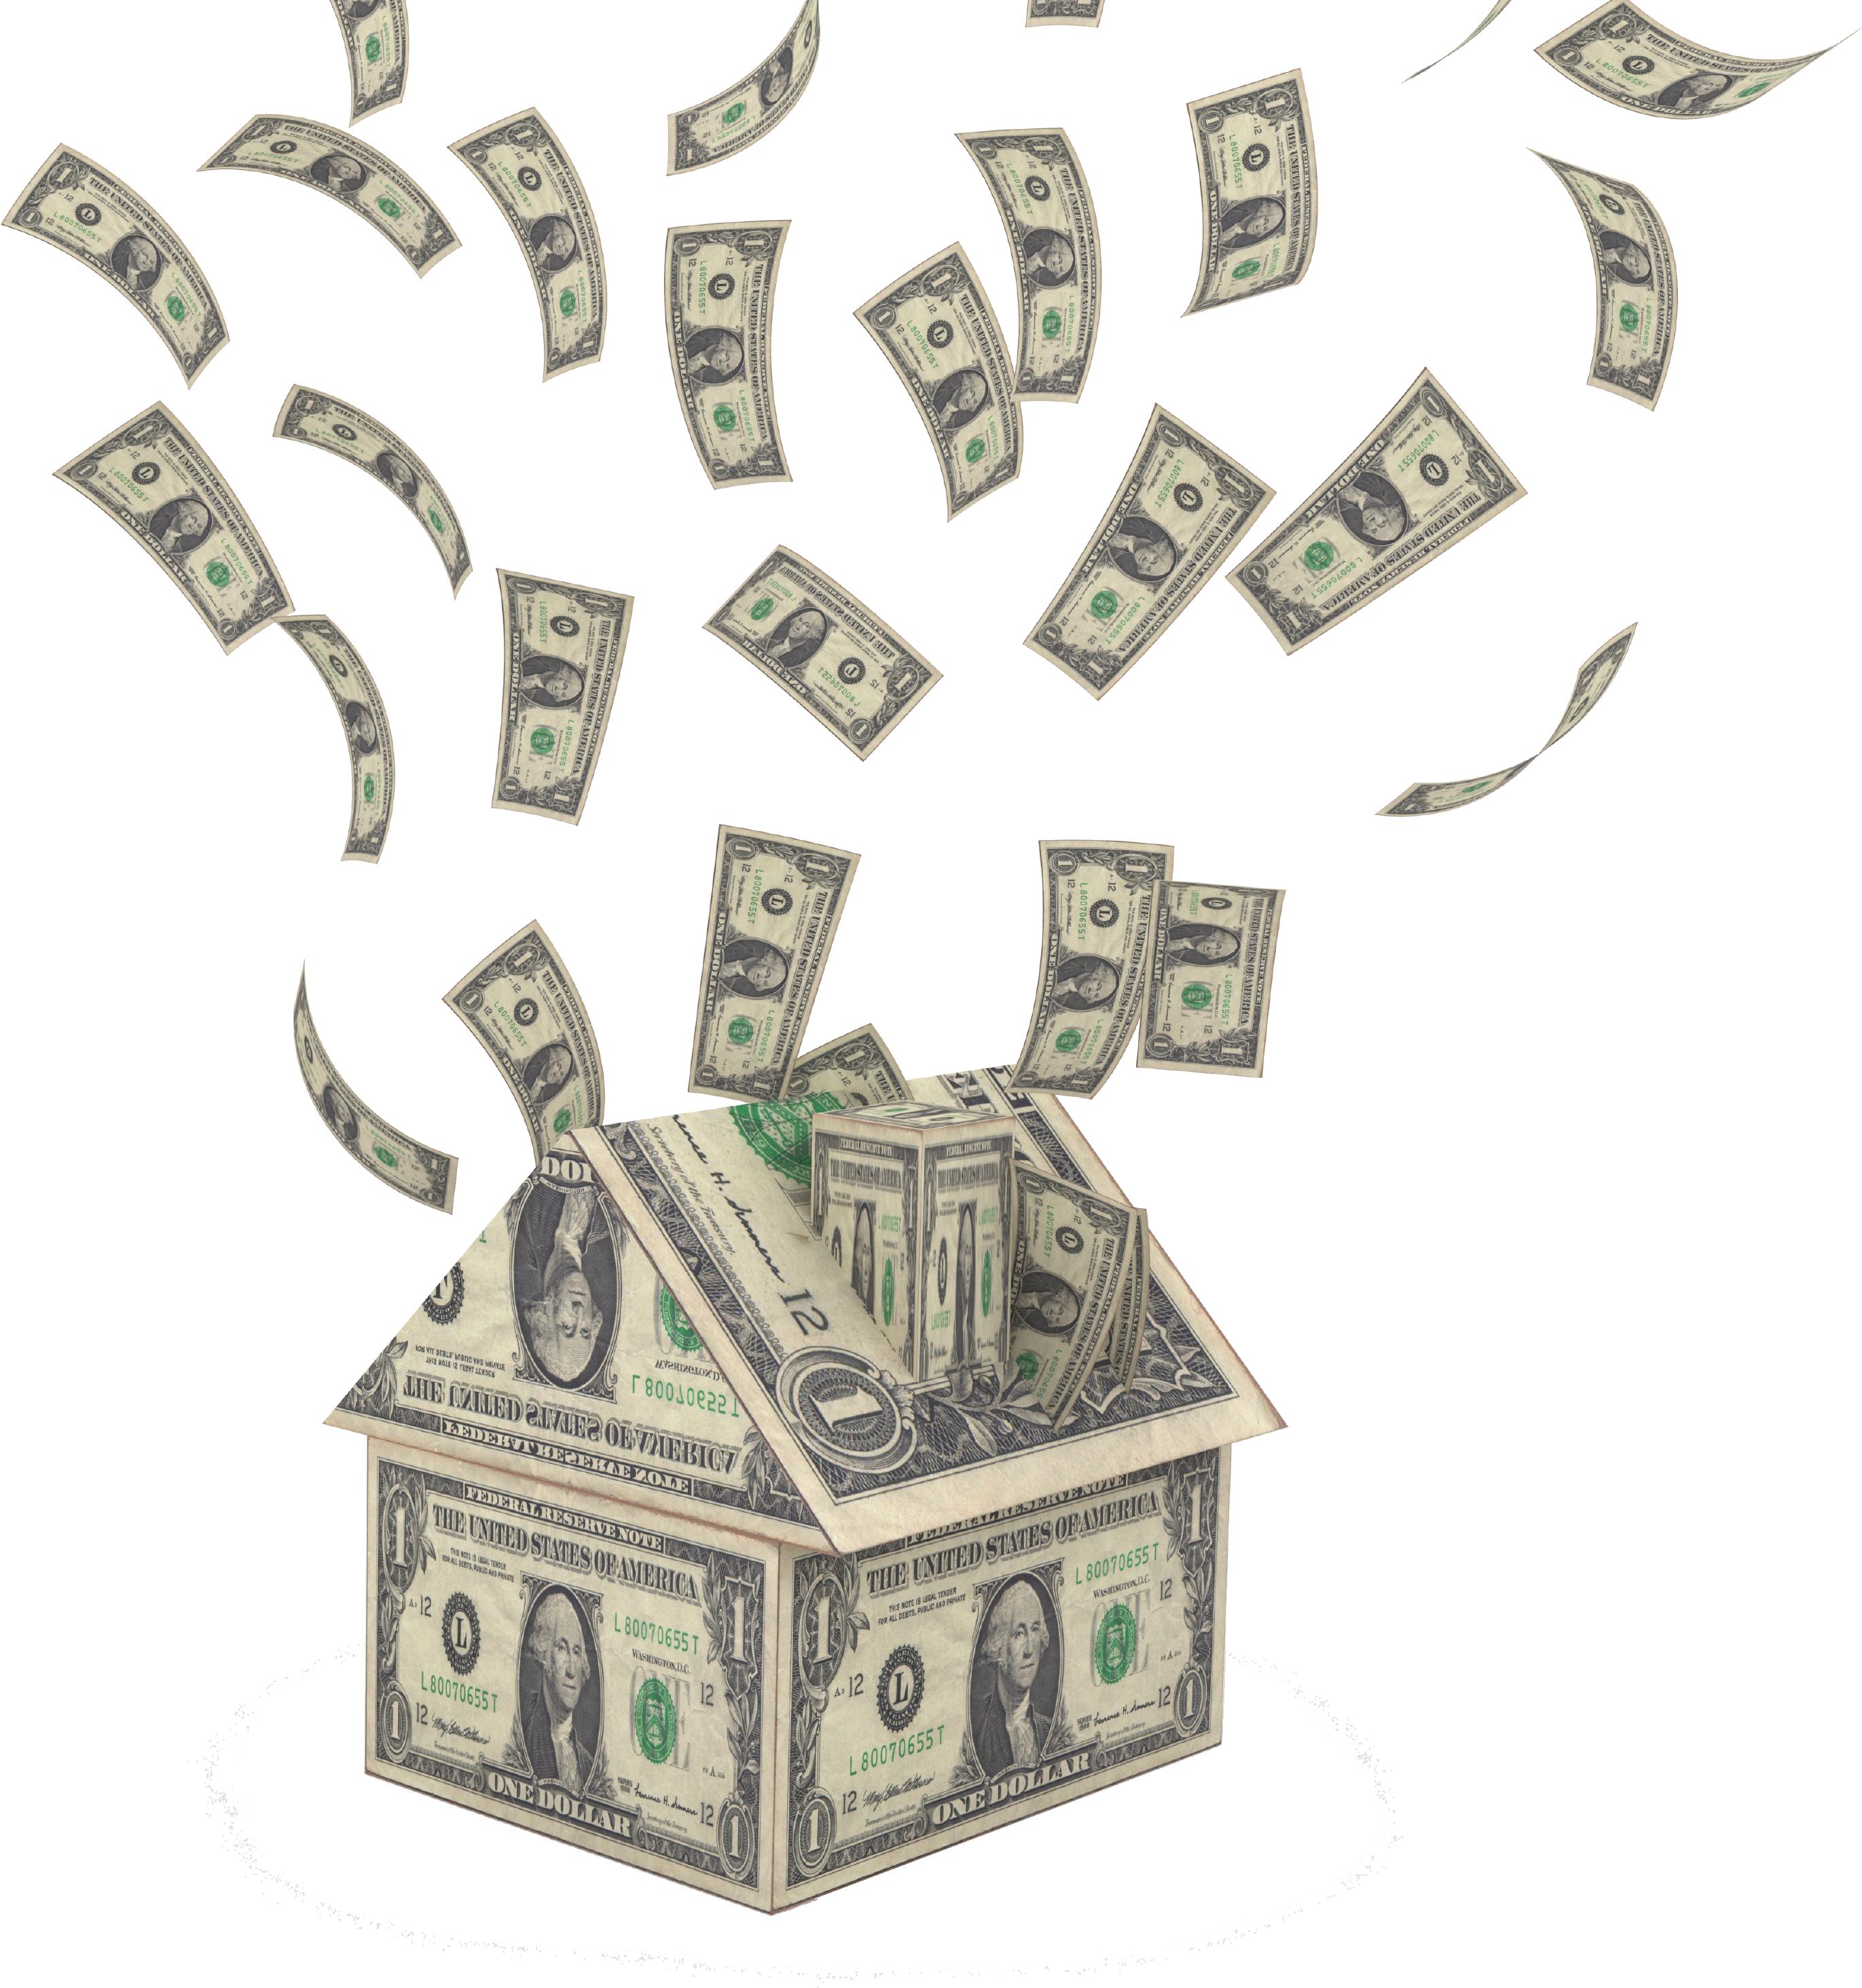 Image purepng free transparent. Falling money background png